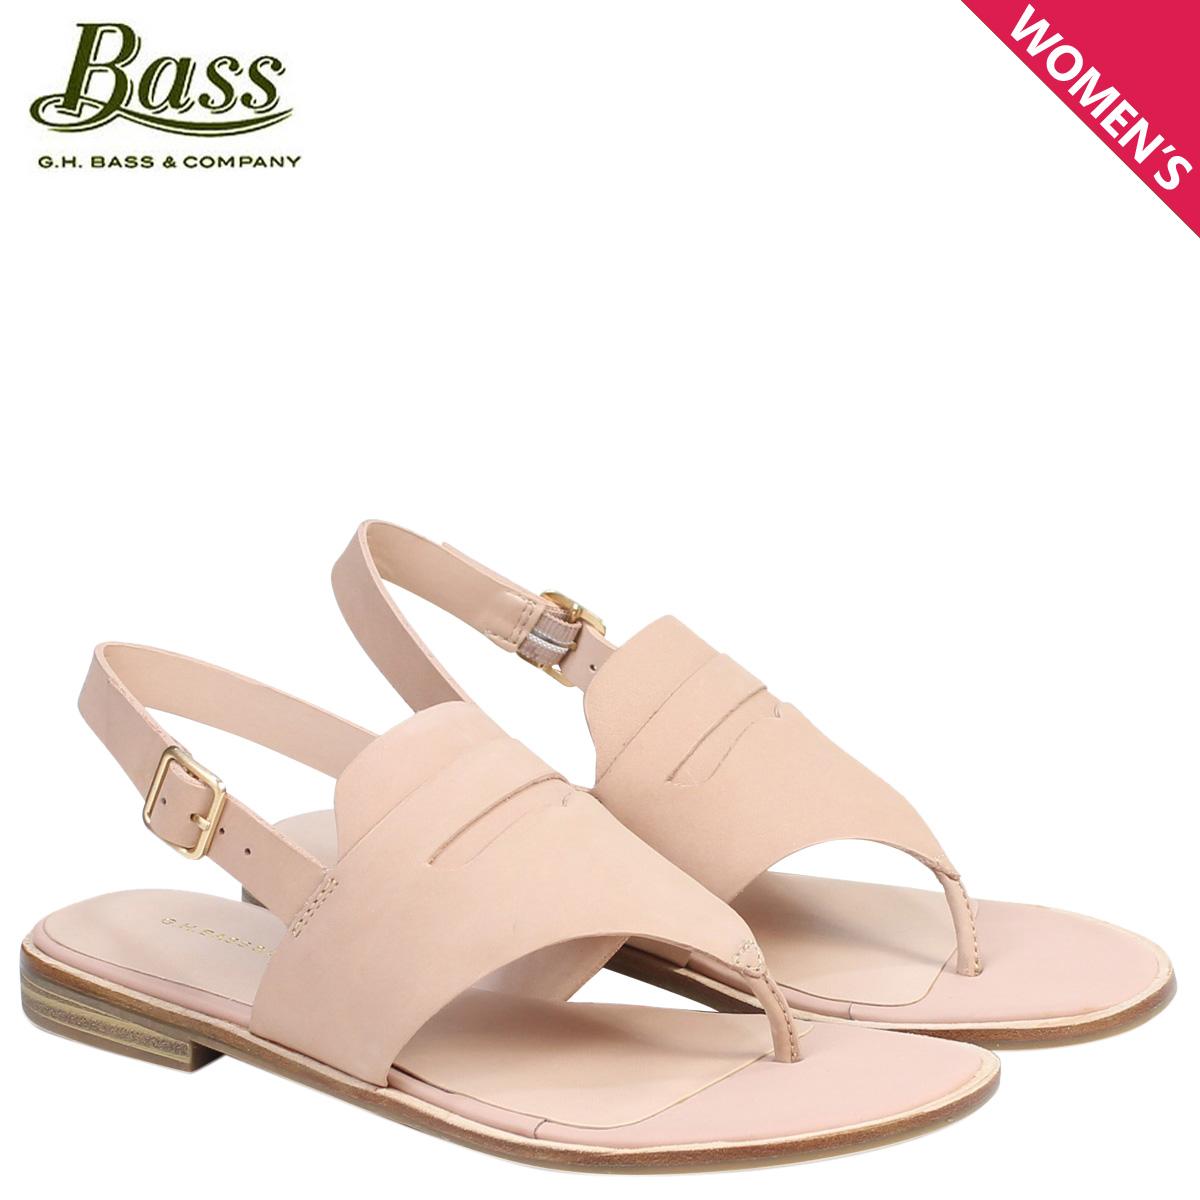 8aab5ff49f9 G.H. BASS sandals lady's G H bus tong ankle strap MADDIE THONG SANDAL  71-20,331 shoes pink